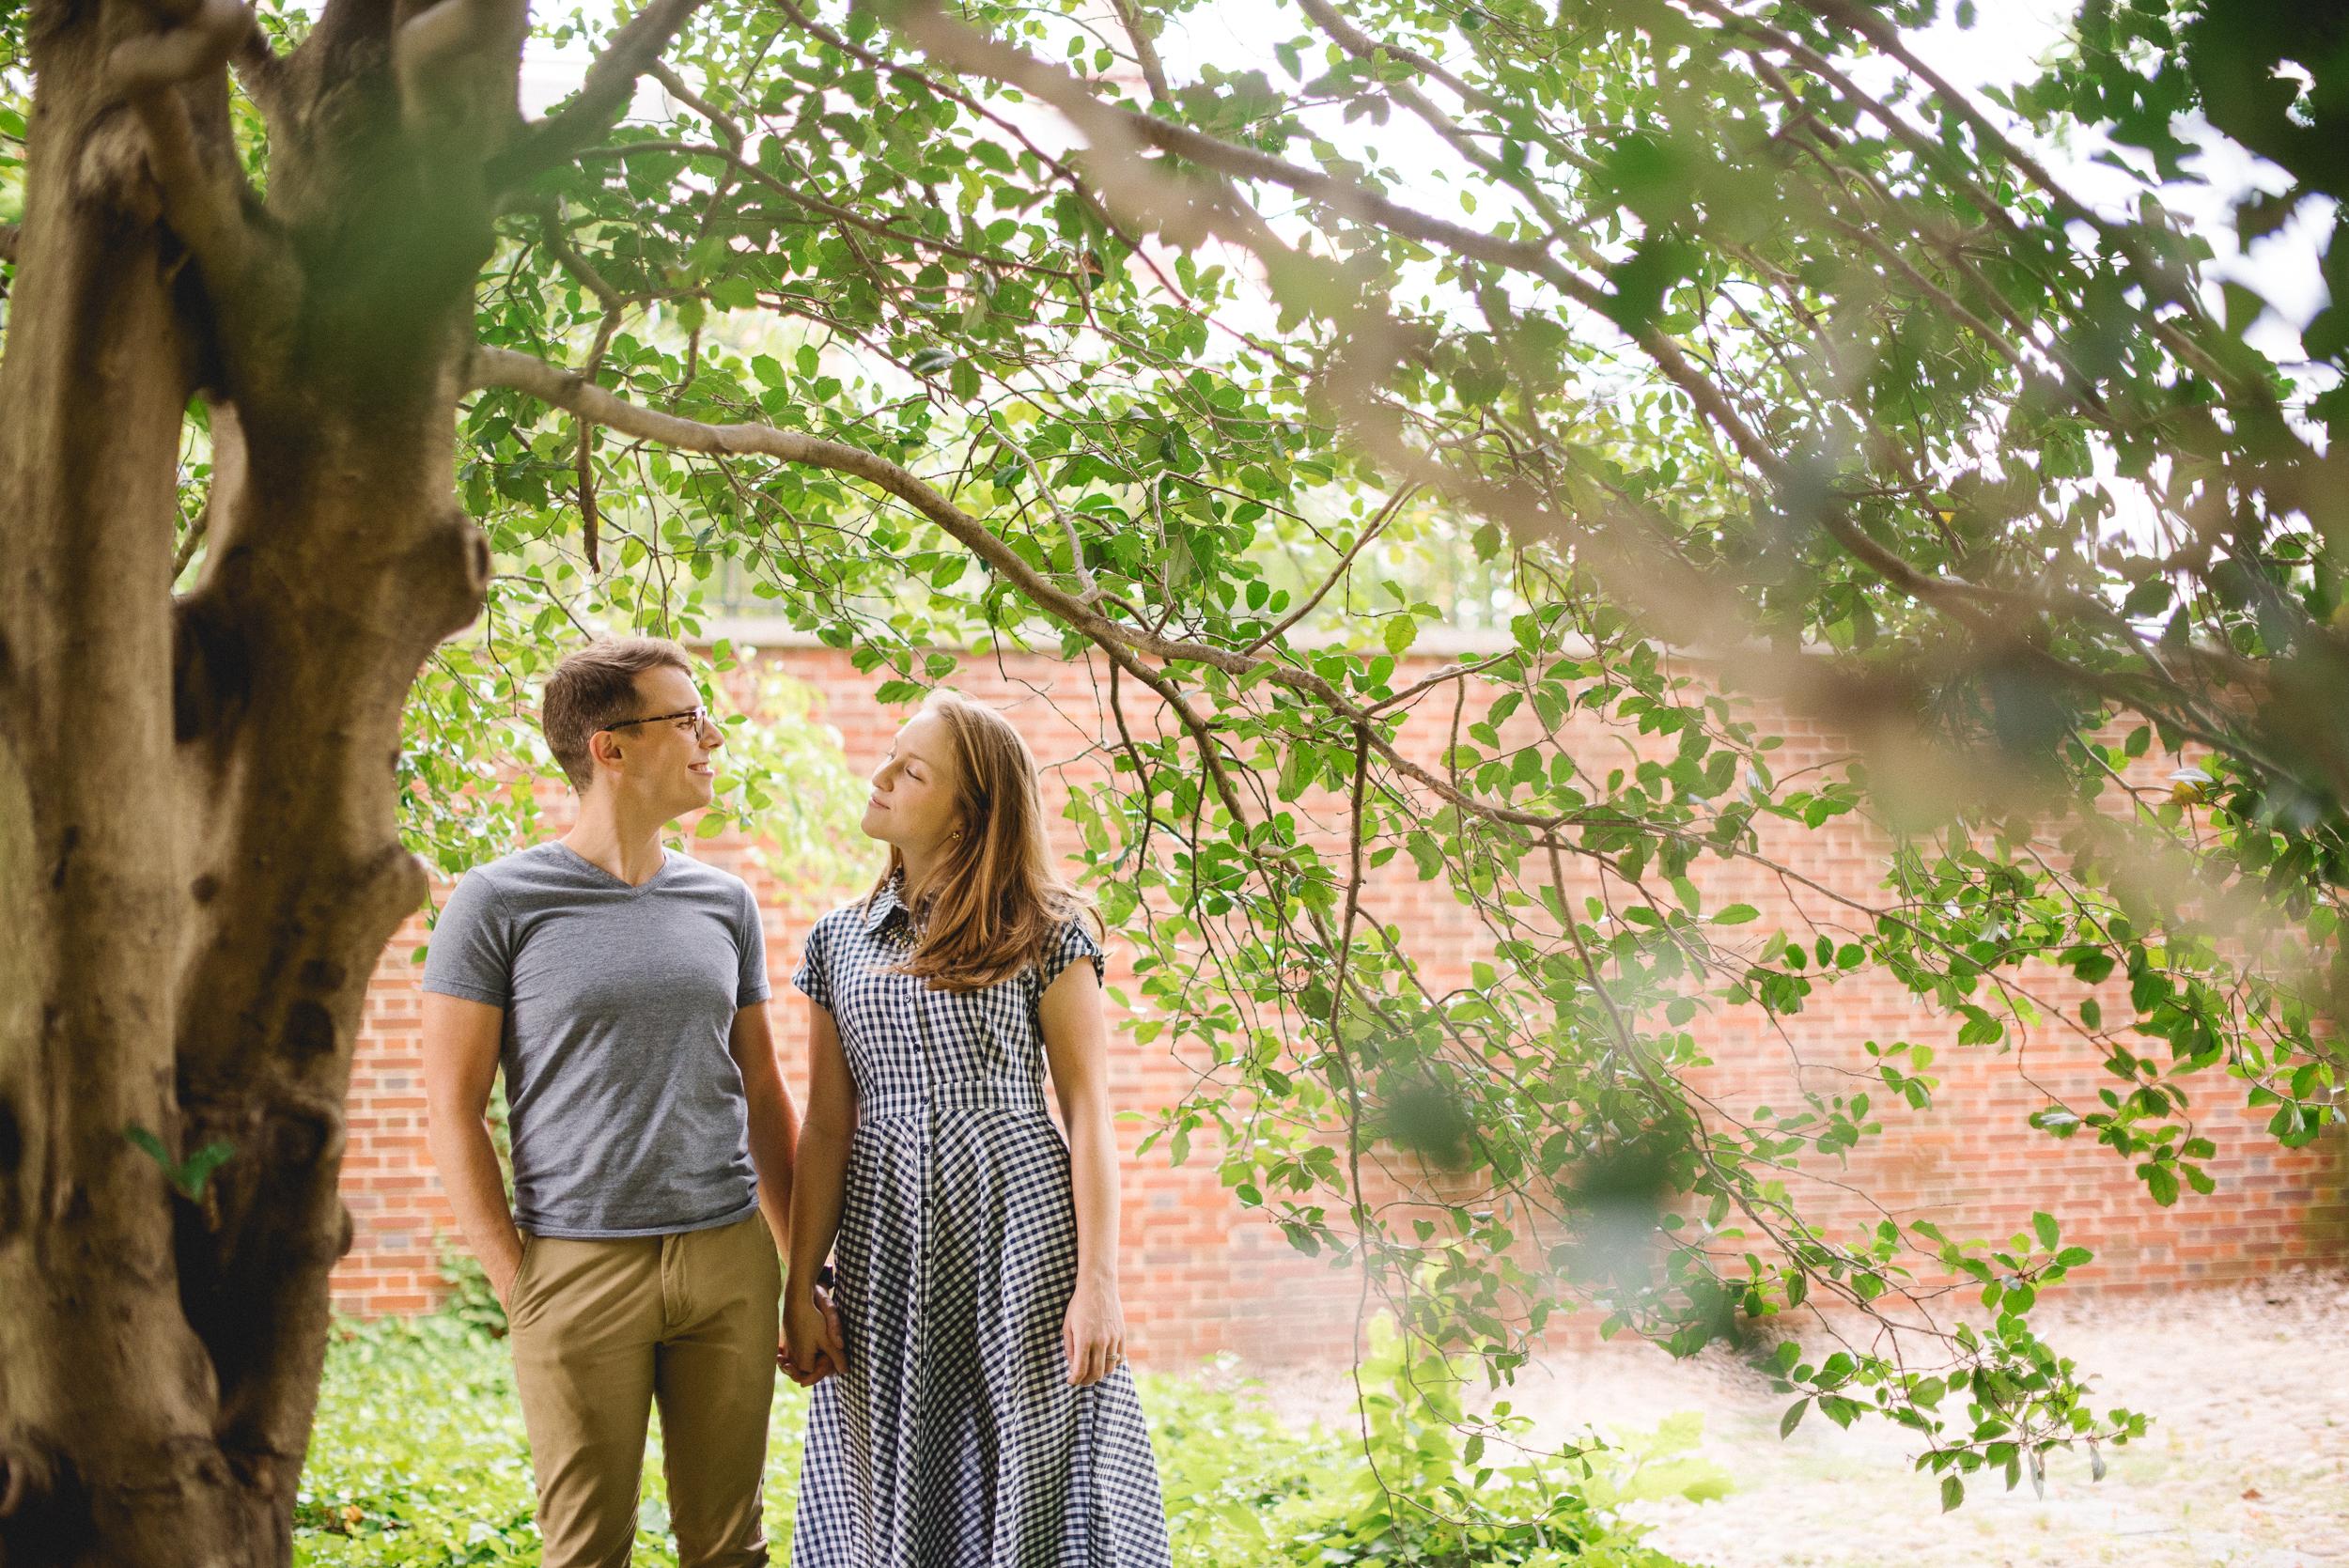 Peaberry-Photography-Society-Hill-Philadelphia-Pennsylvania-Newlyweds-Just-Married-006.jpg